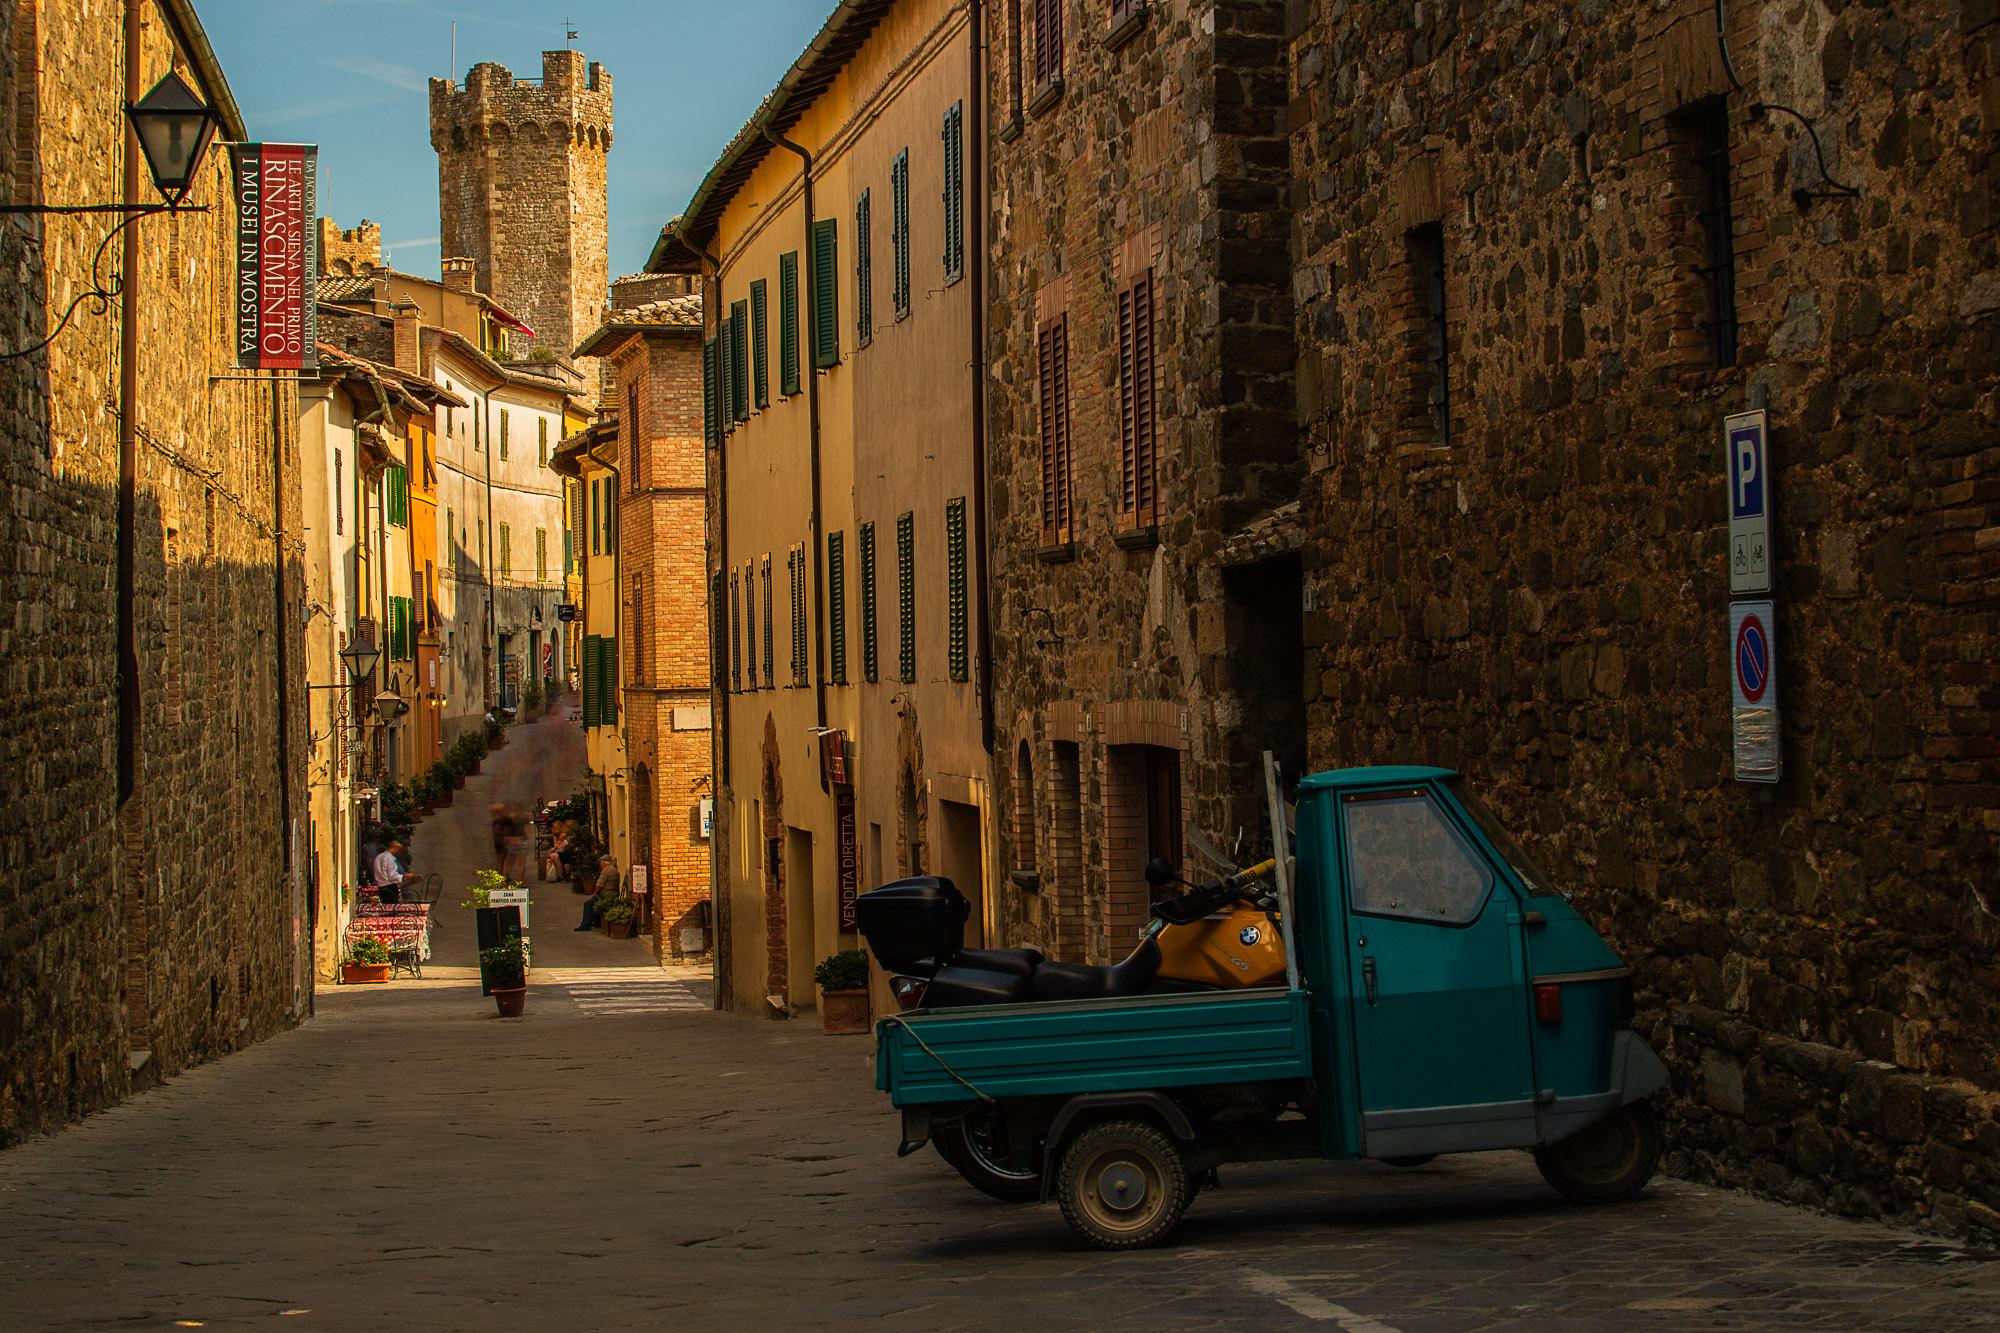 Montalcino Street, Italy